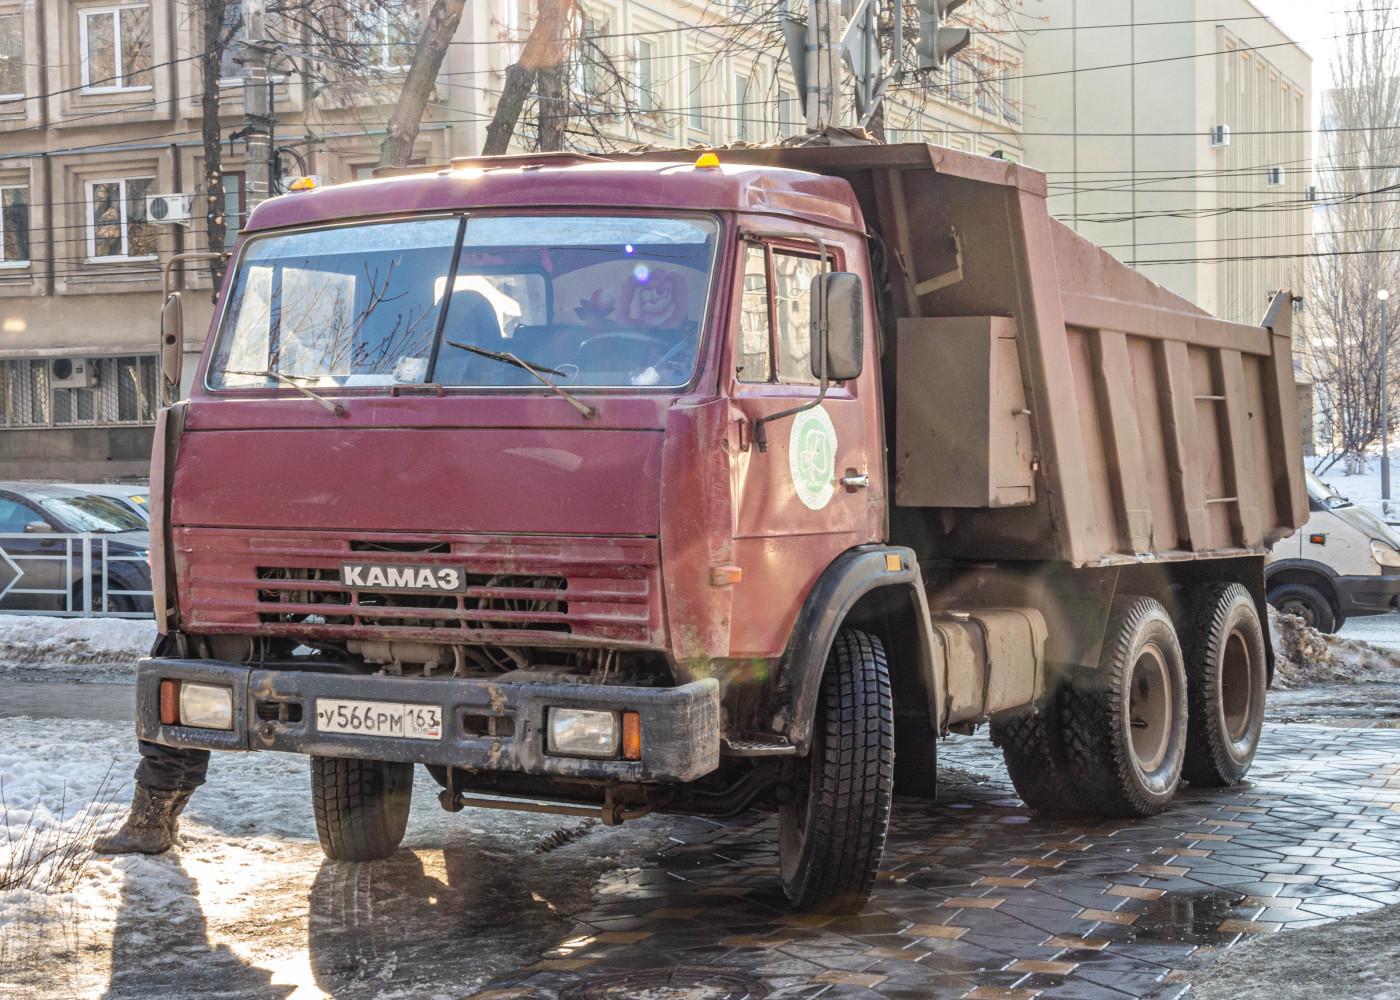 самосвал КамАЗ-65115 #У566РМ163. г. Самара, пр. Ленина